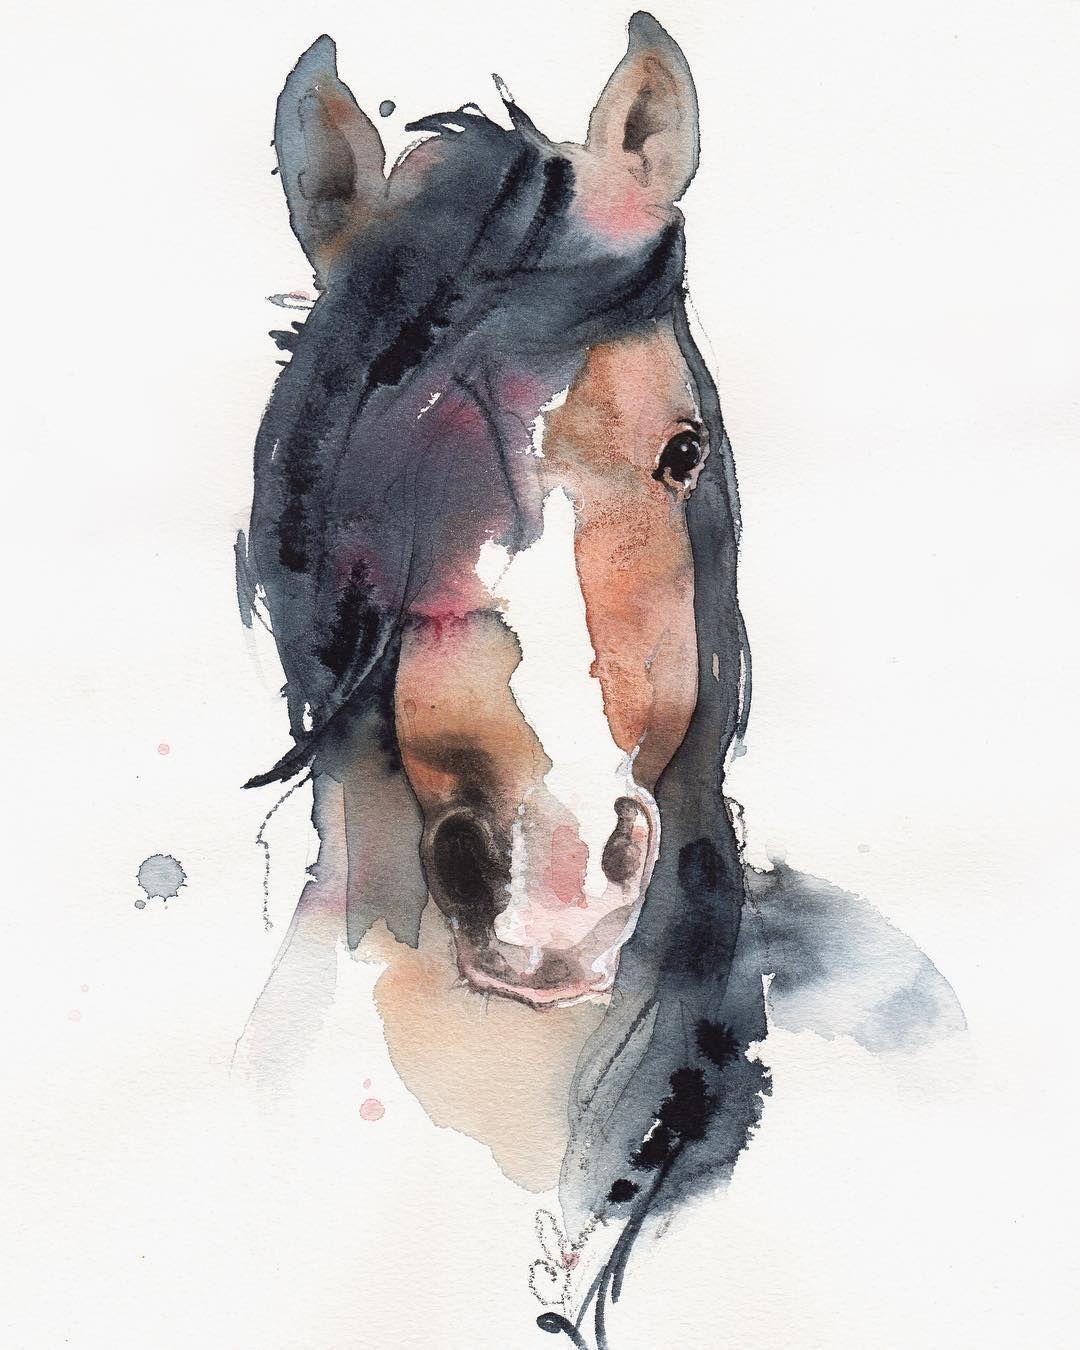 Aquarell Tiere Auf Dem Bauernhof 1 Aquarell Tiere Auf Dem Bauernhof Aquarell Kunst Pfer Watercolor Horse Watercolor Horse Painting Watercolor Pet Portraits